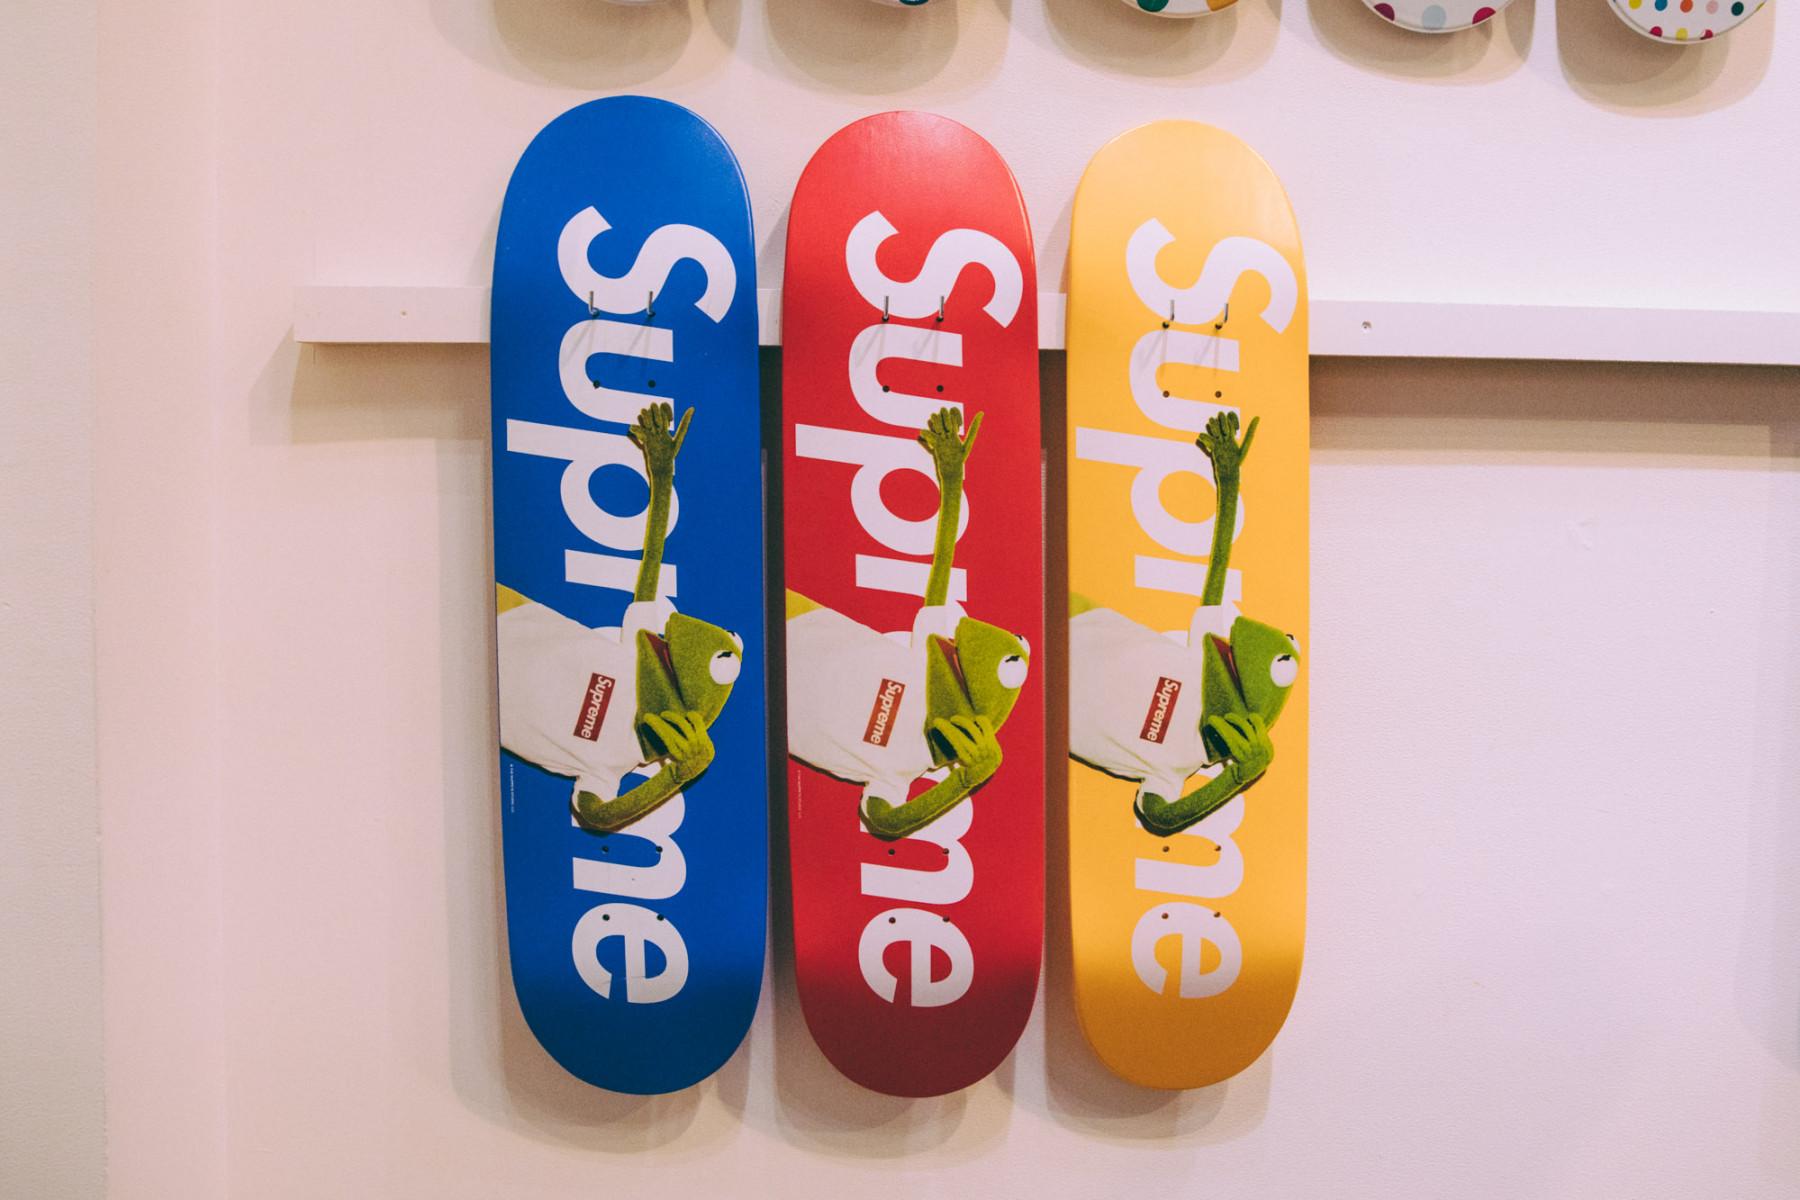 Sothebys-Supreme-Skate-Decks-10-1800x1200